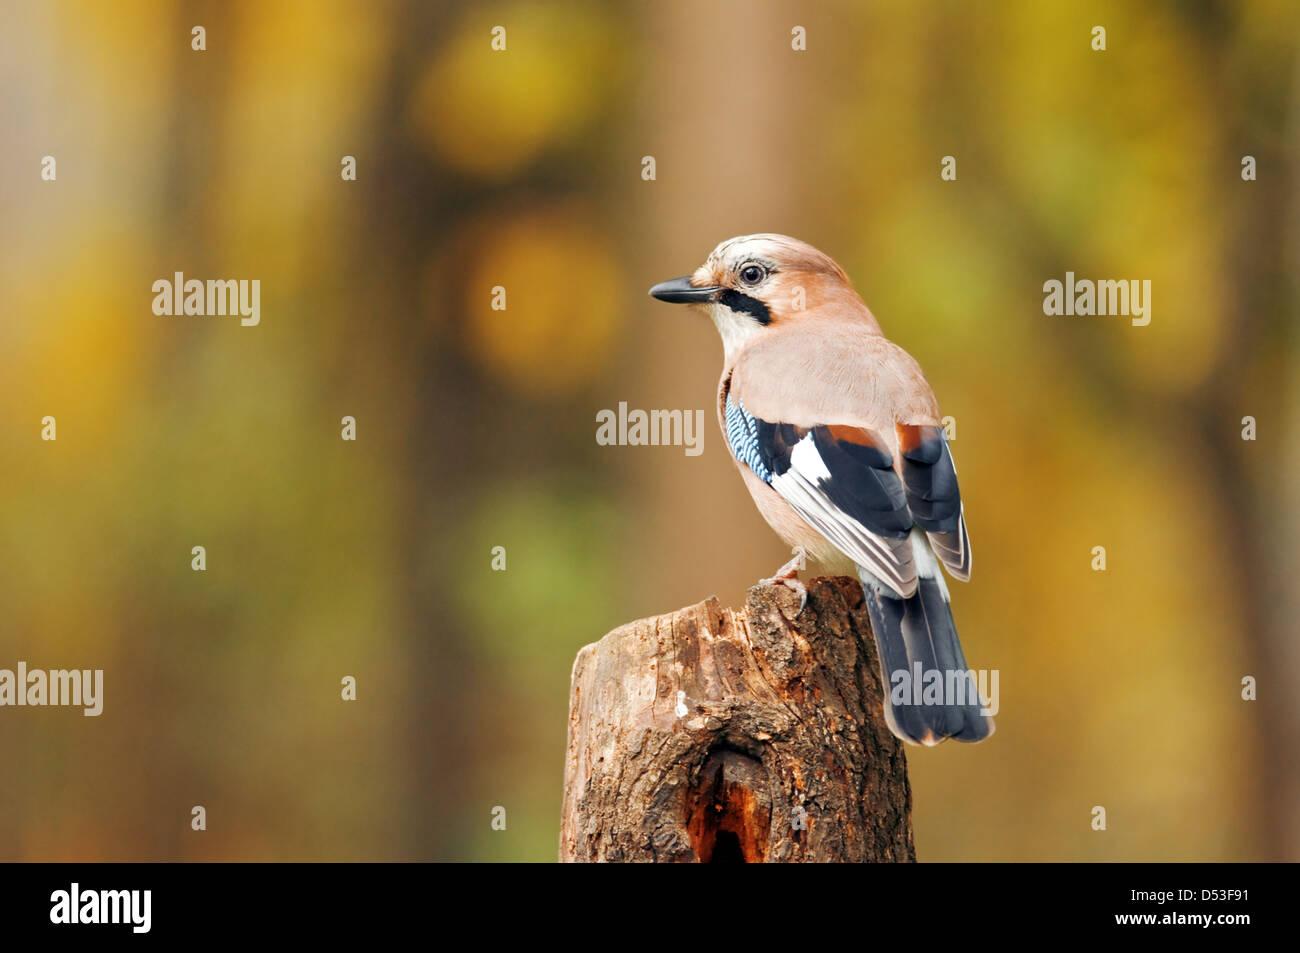 jay bird on twig close up - Stock Image